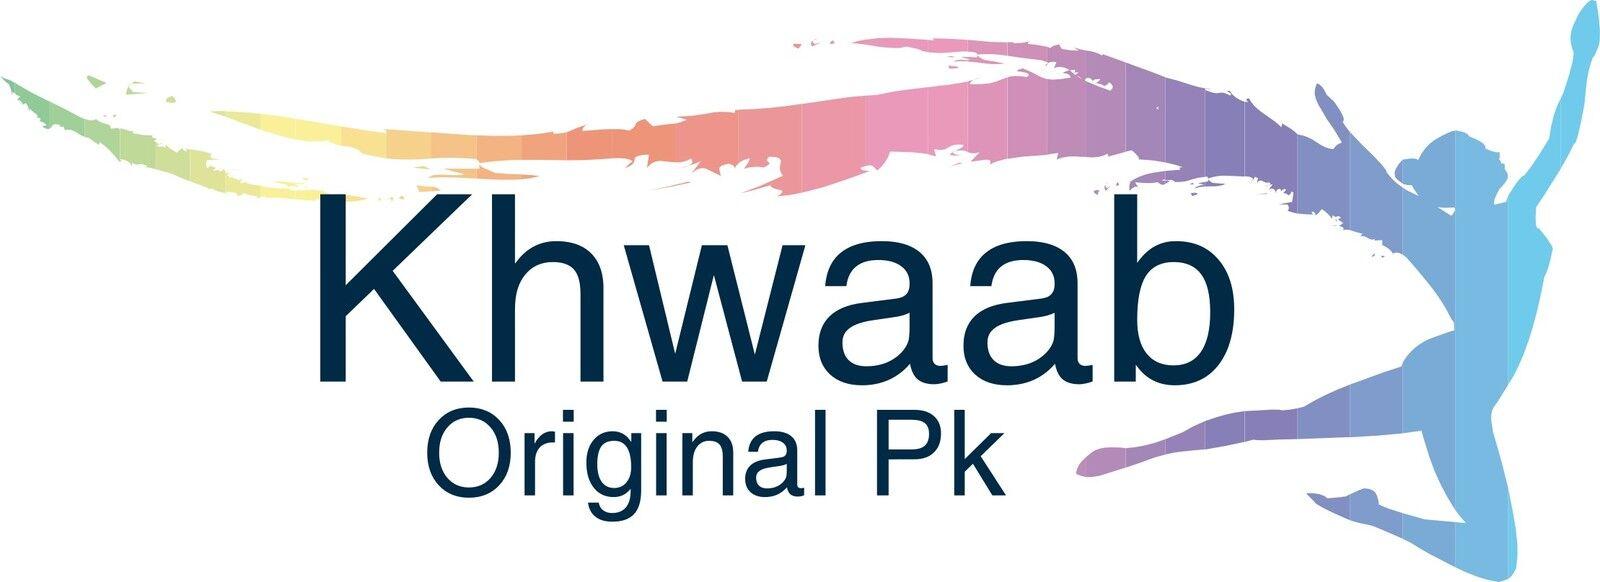 khwaab original pk